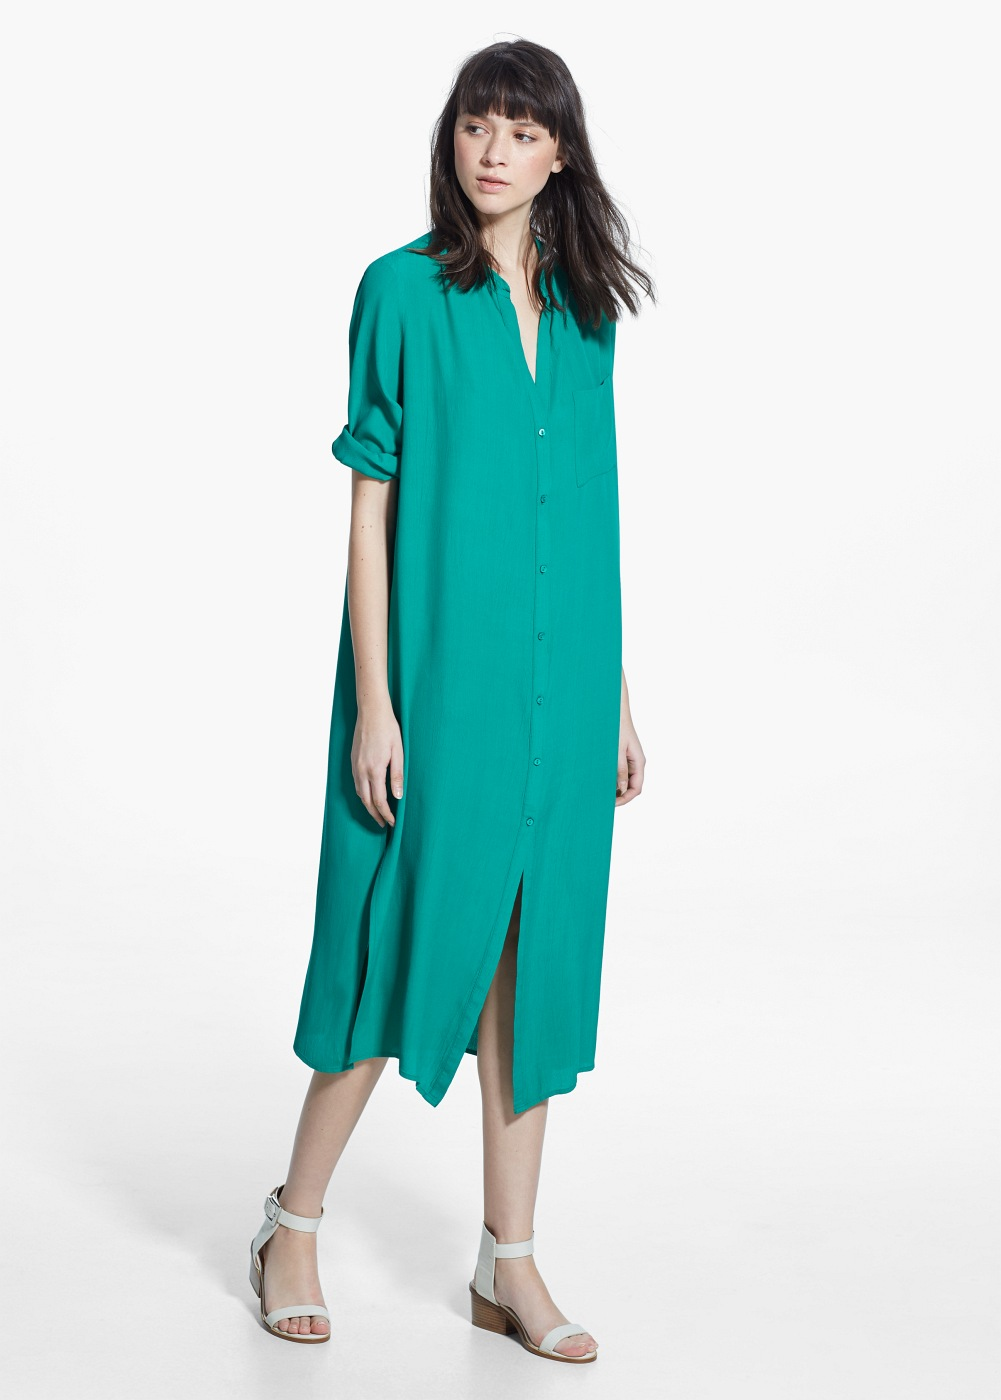 Pocket Shirt Dress , $79.99